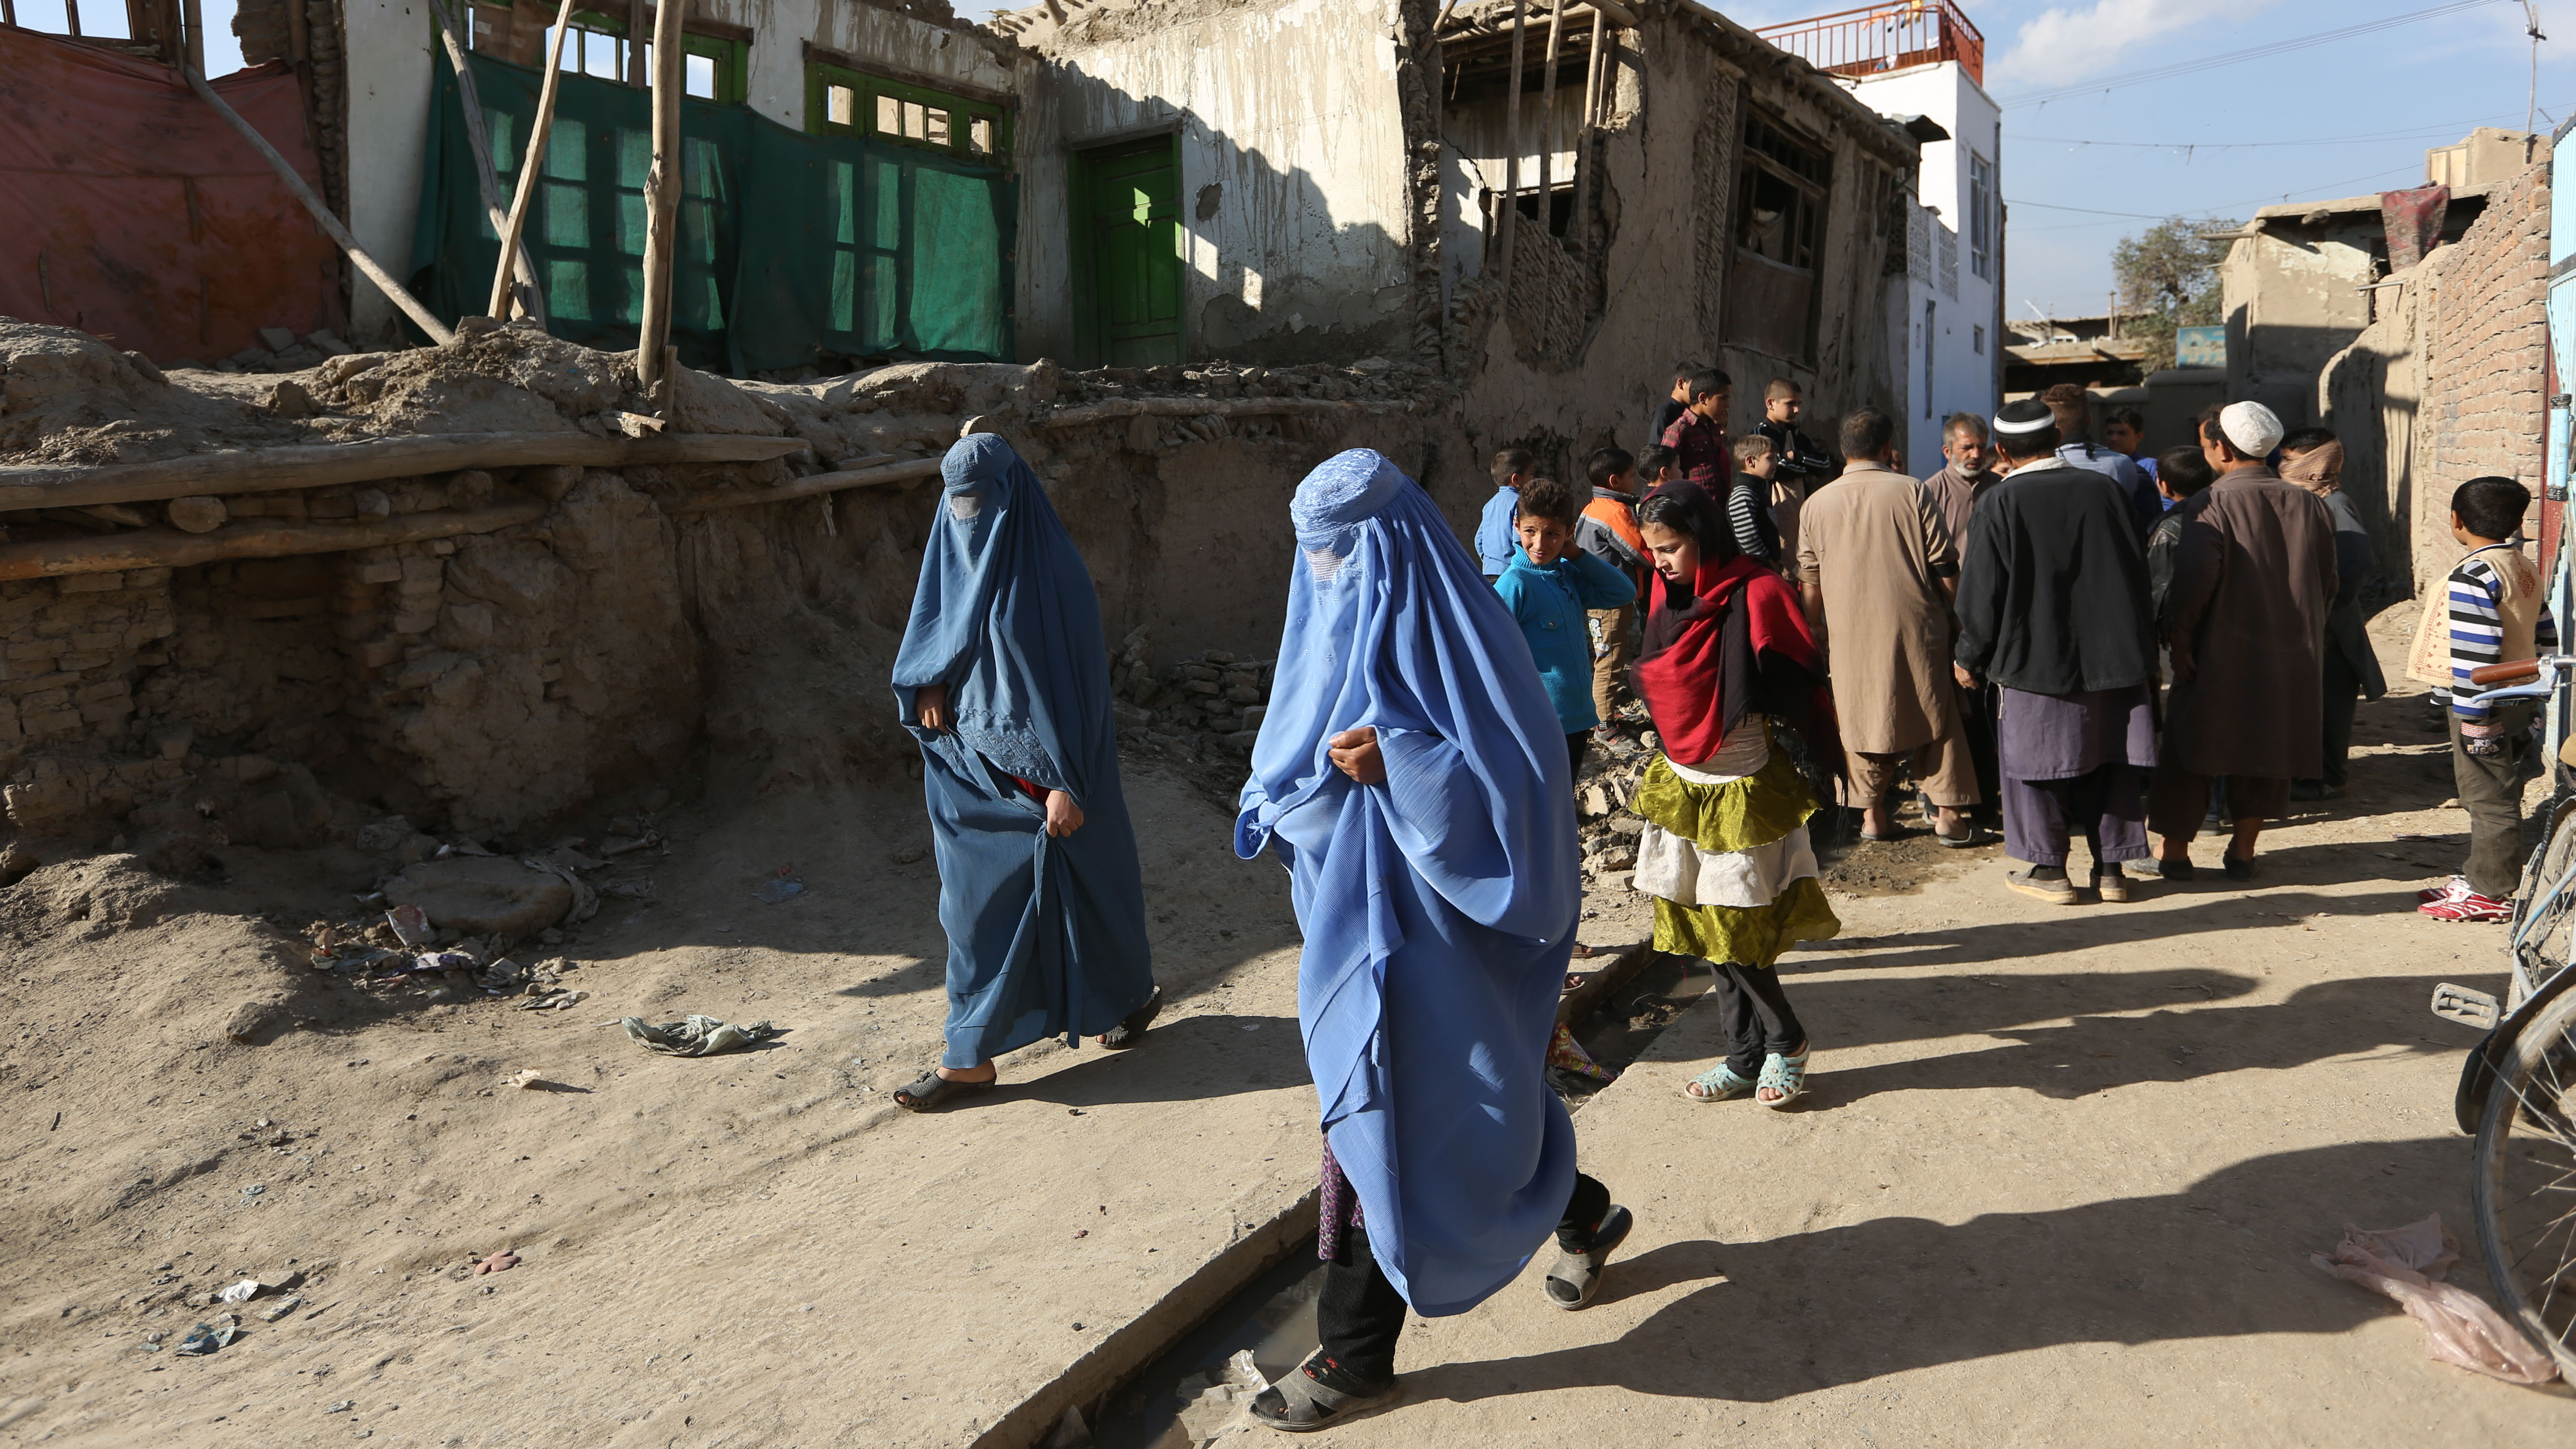 Kraftigt jordskalv i norra pakistan